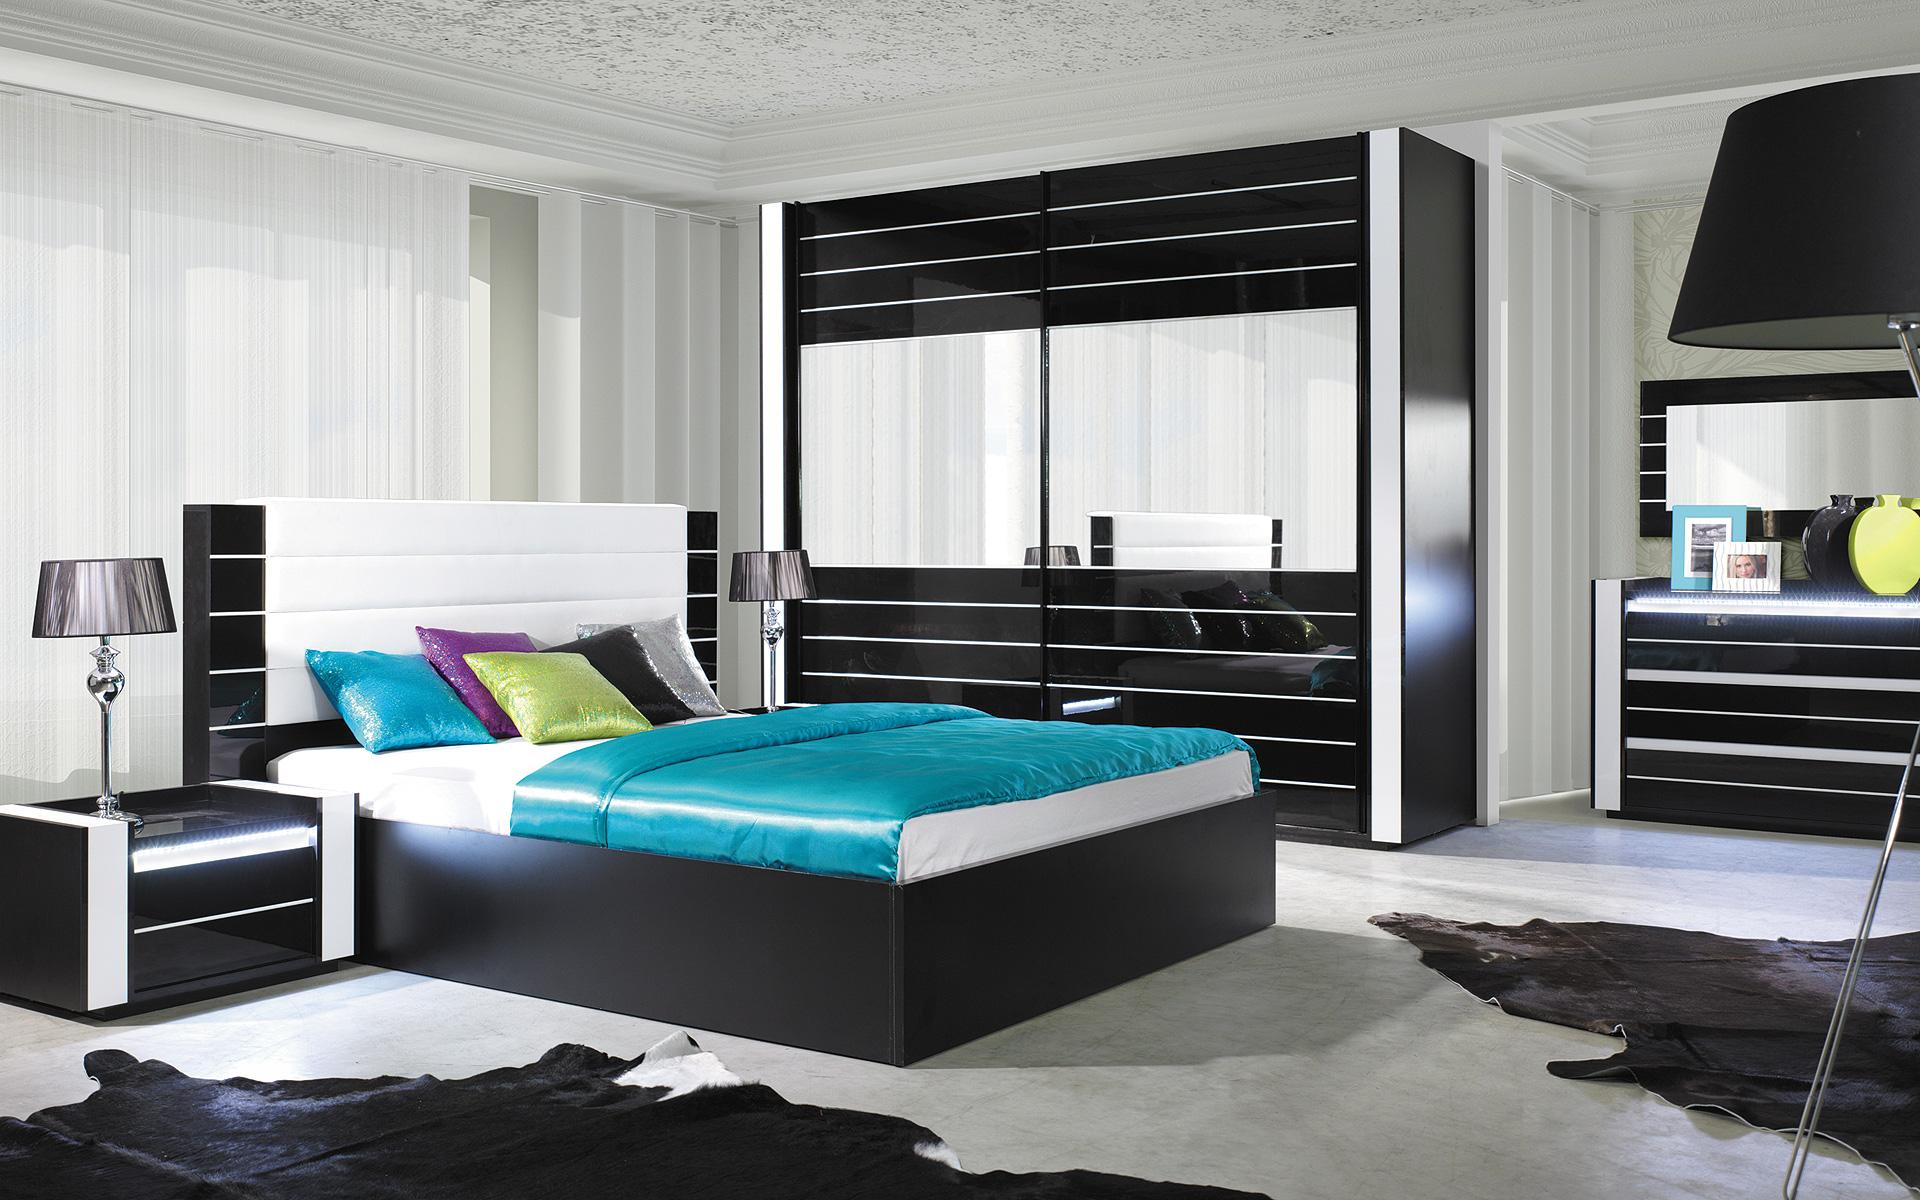 Va doriti mobila de dormitor de calitate si preturi accesibile?